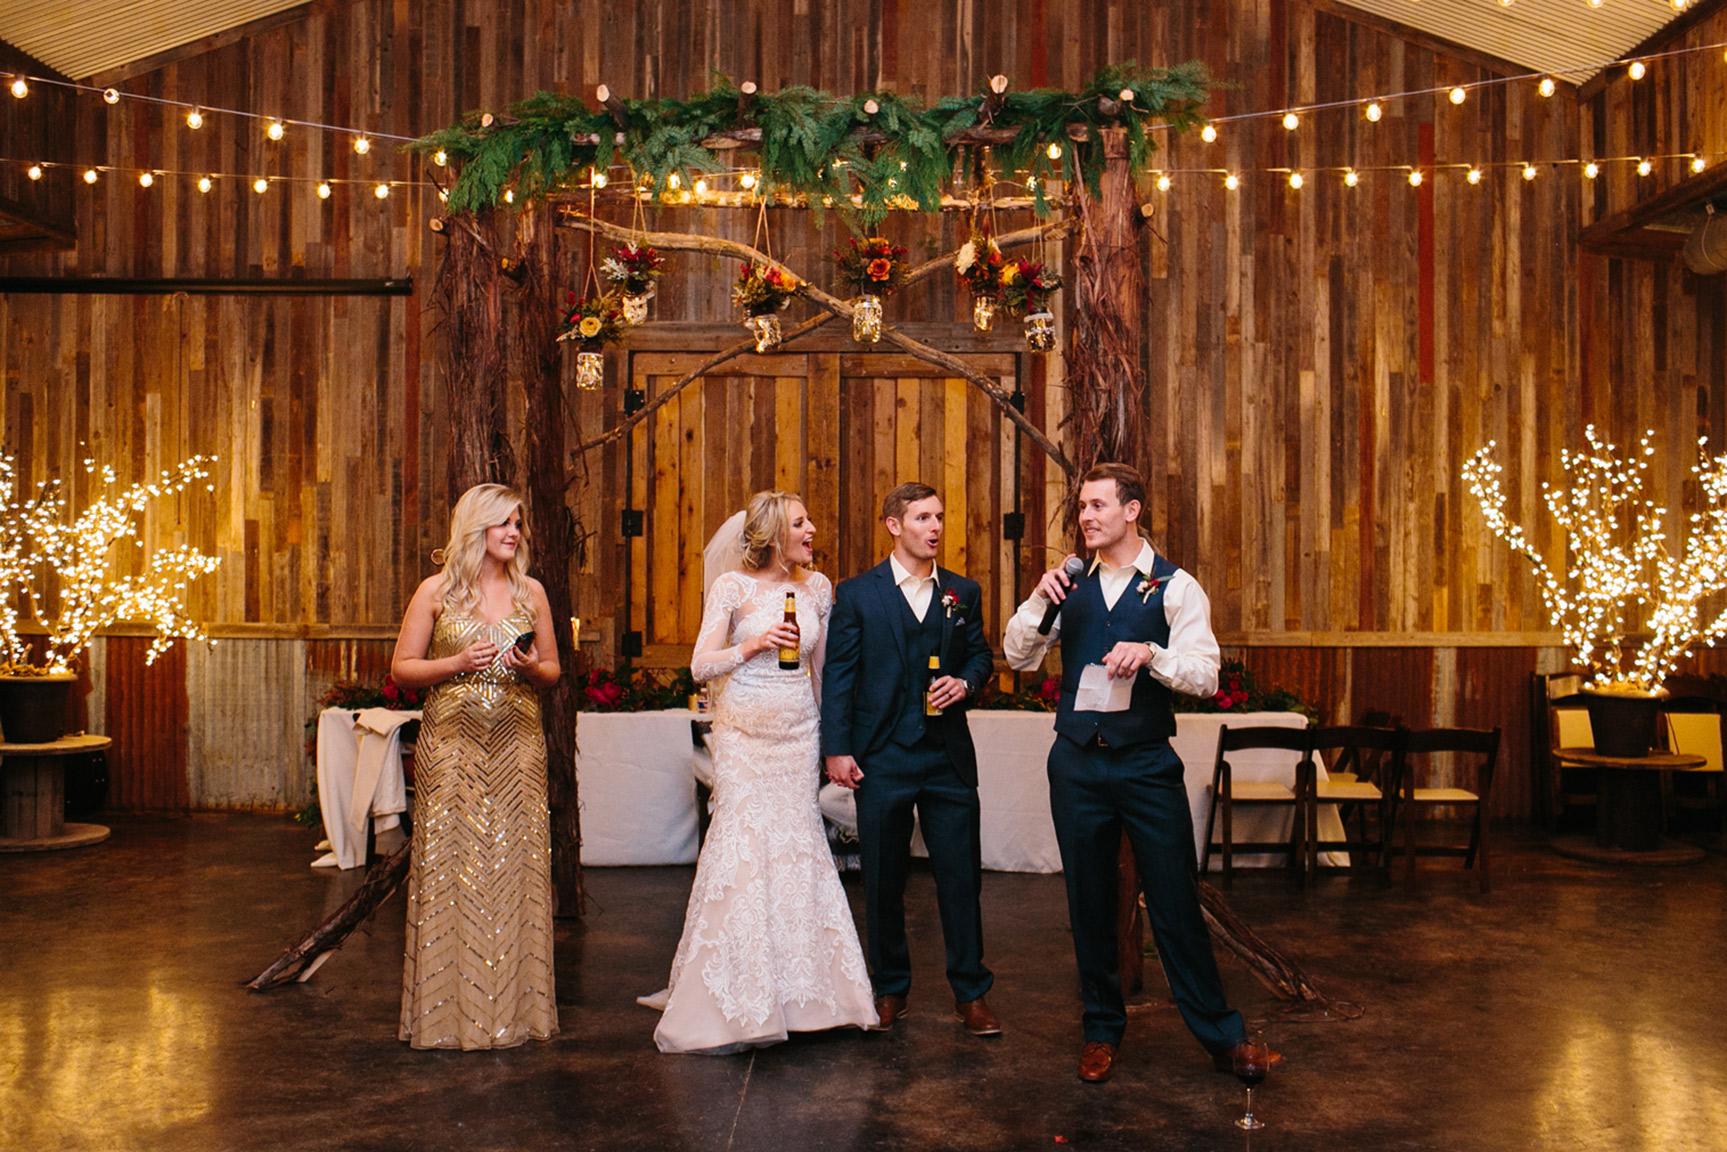 Cotton_Creek_Barn_Winter_Wedding_WeddingPhotographer054.jpg